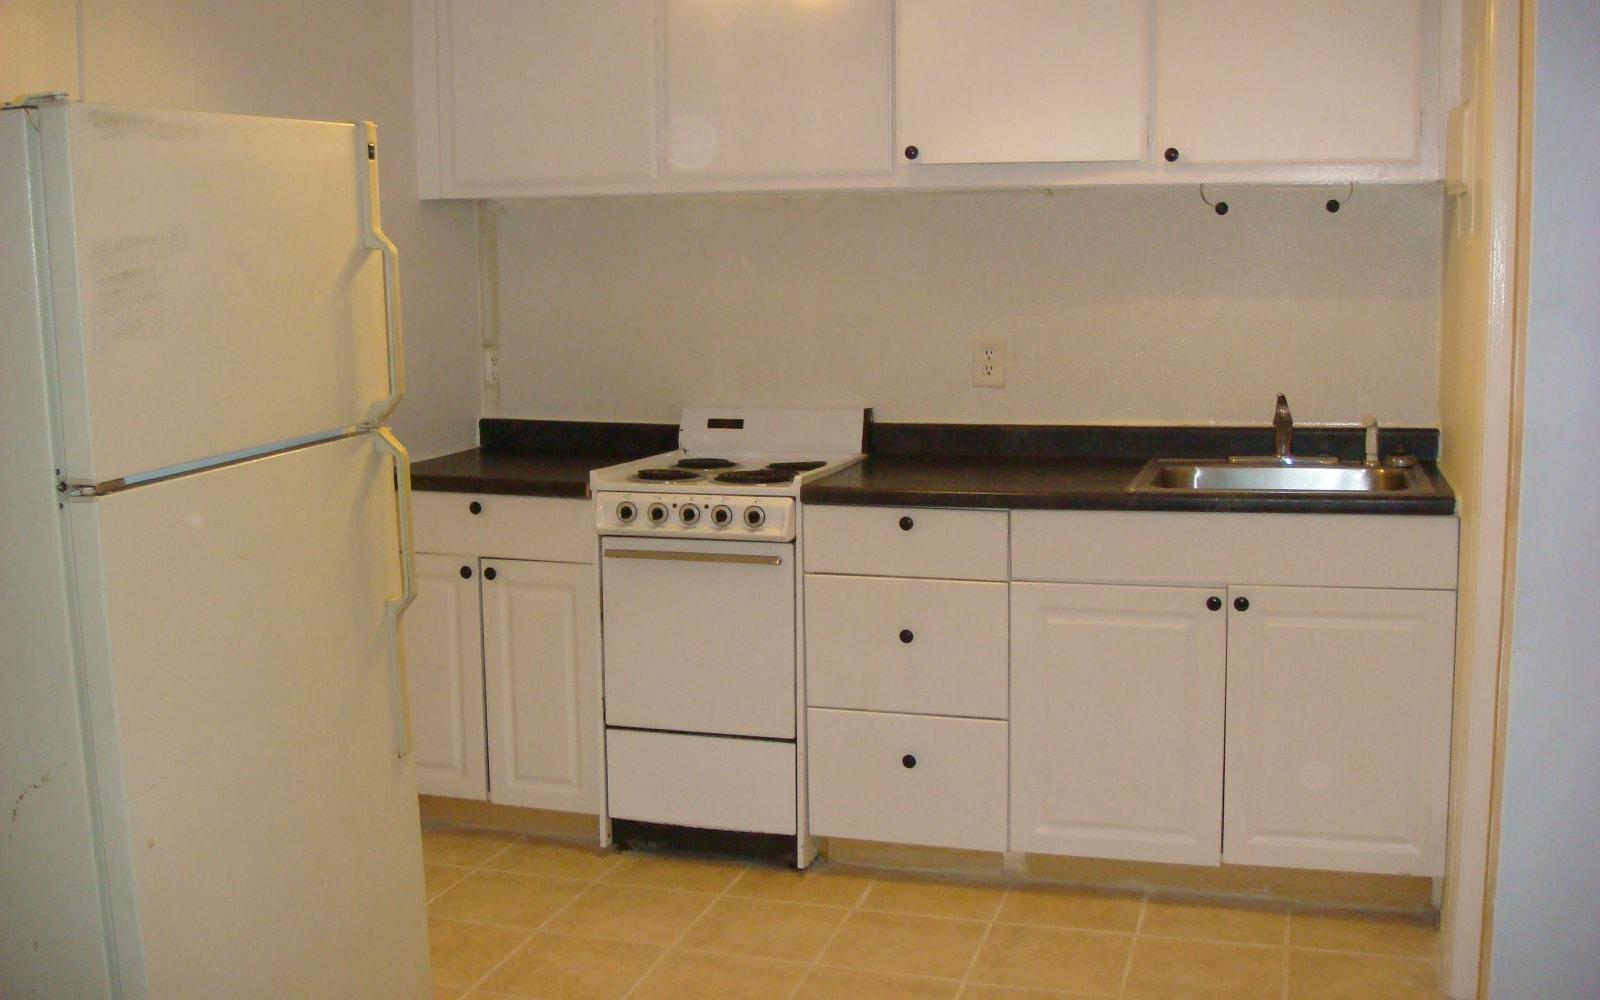 Open kitchen layout at 400 Atlantic in Bridgeport, Connecticut